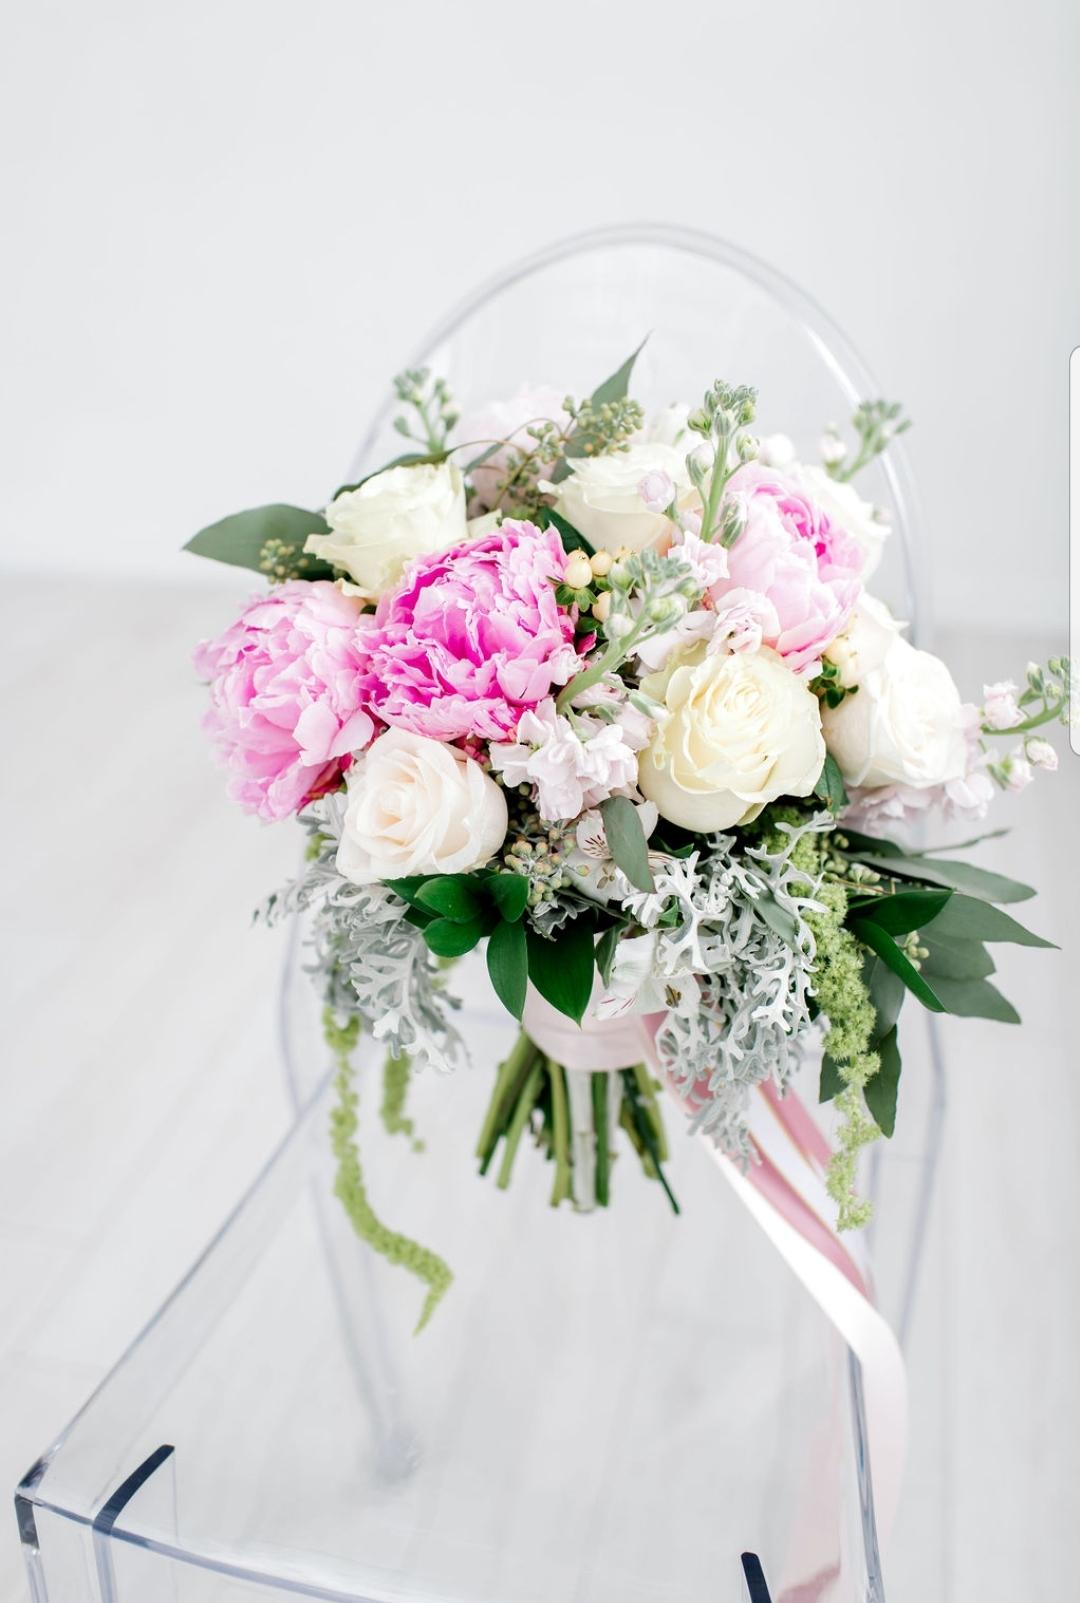 White and pink bridal leksi skerritt pho